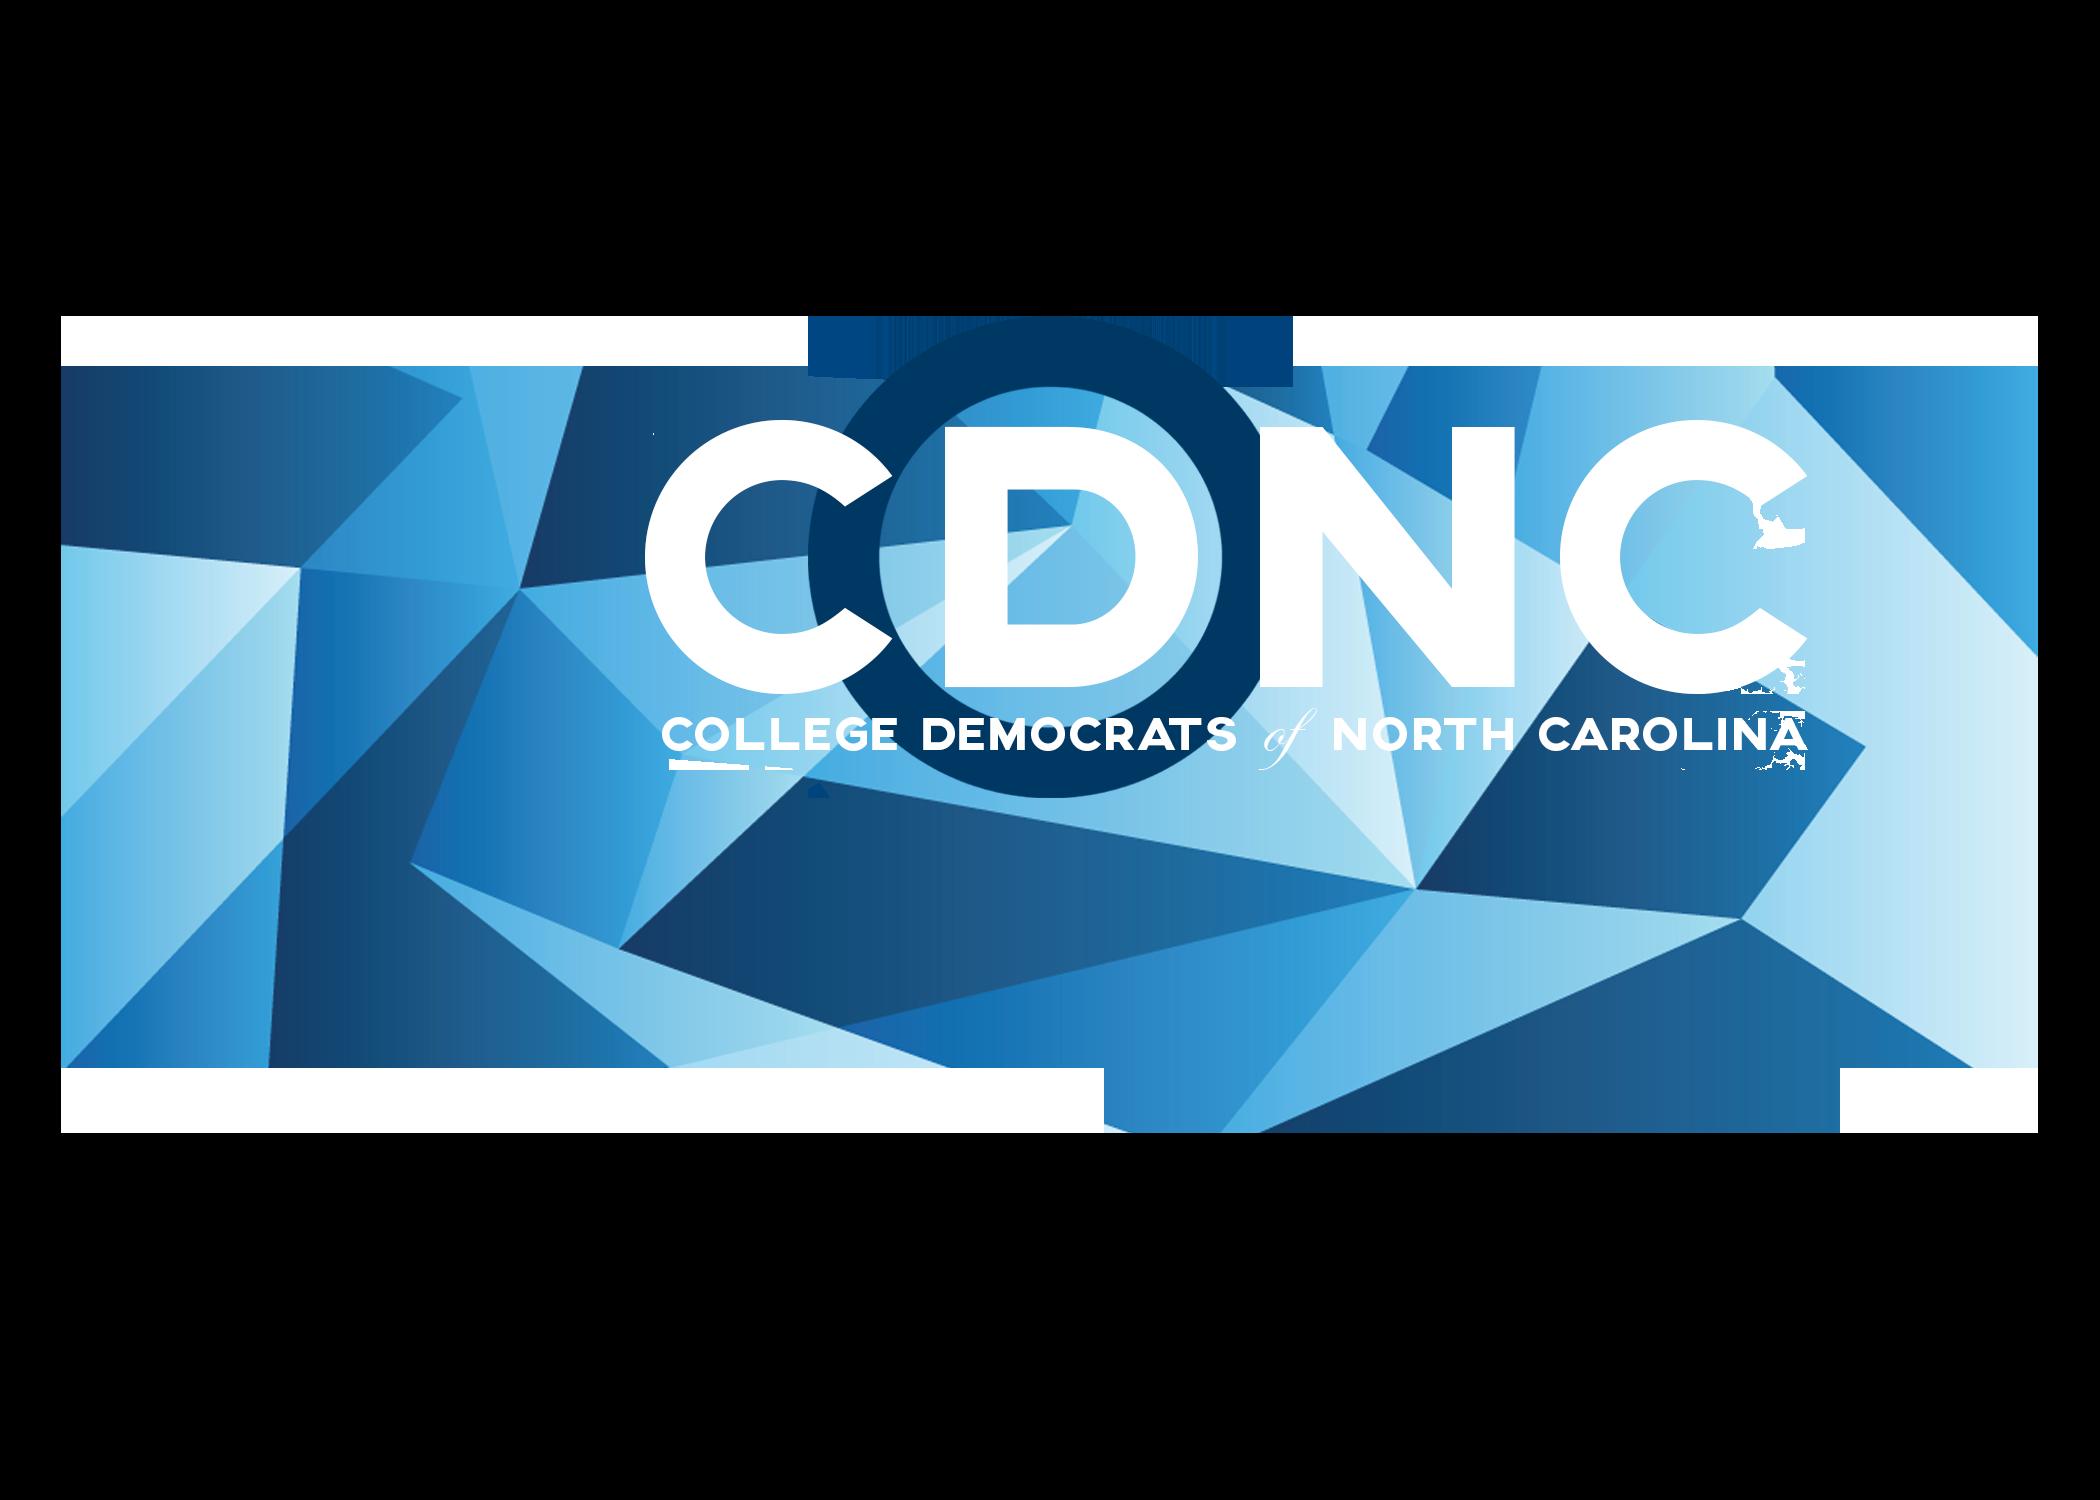 College Democrats of North Carolina